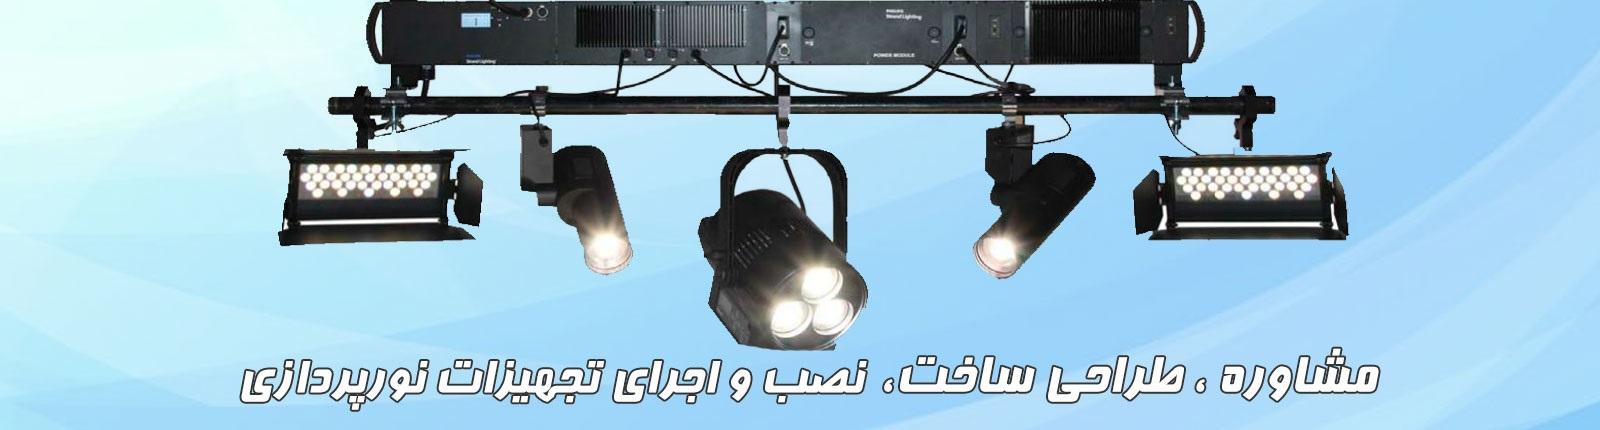 شرکت نور صنعت جام جم